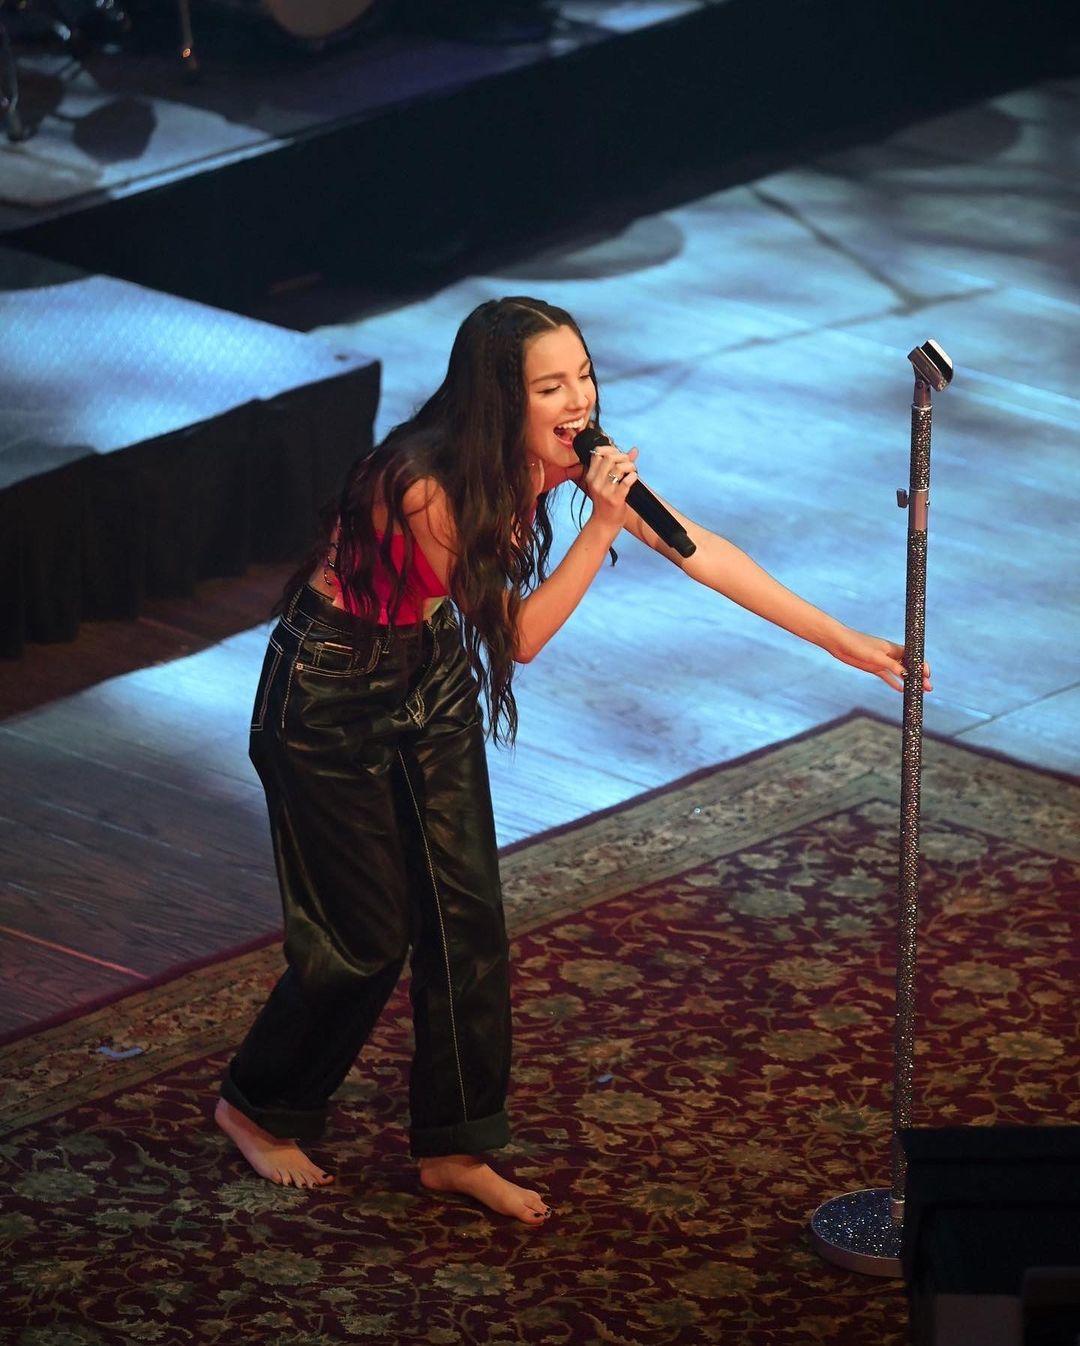 https://pics.wikifeet.com/Olivia-Rodrigo-Feet-6043412.jpg